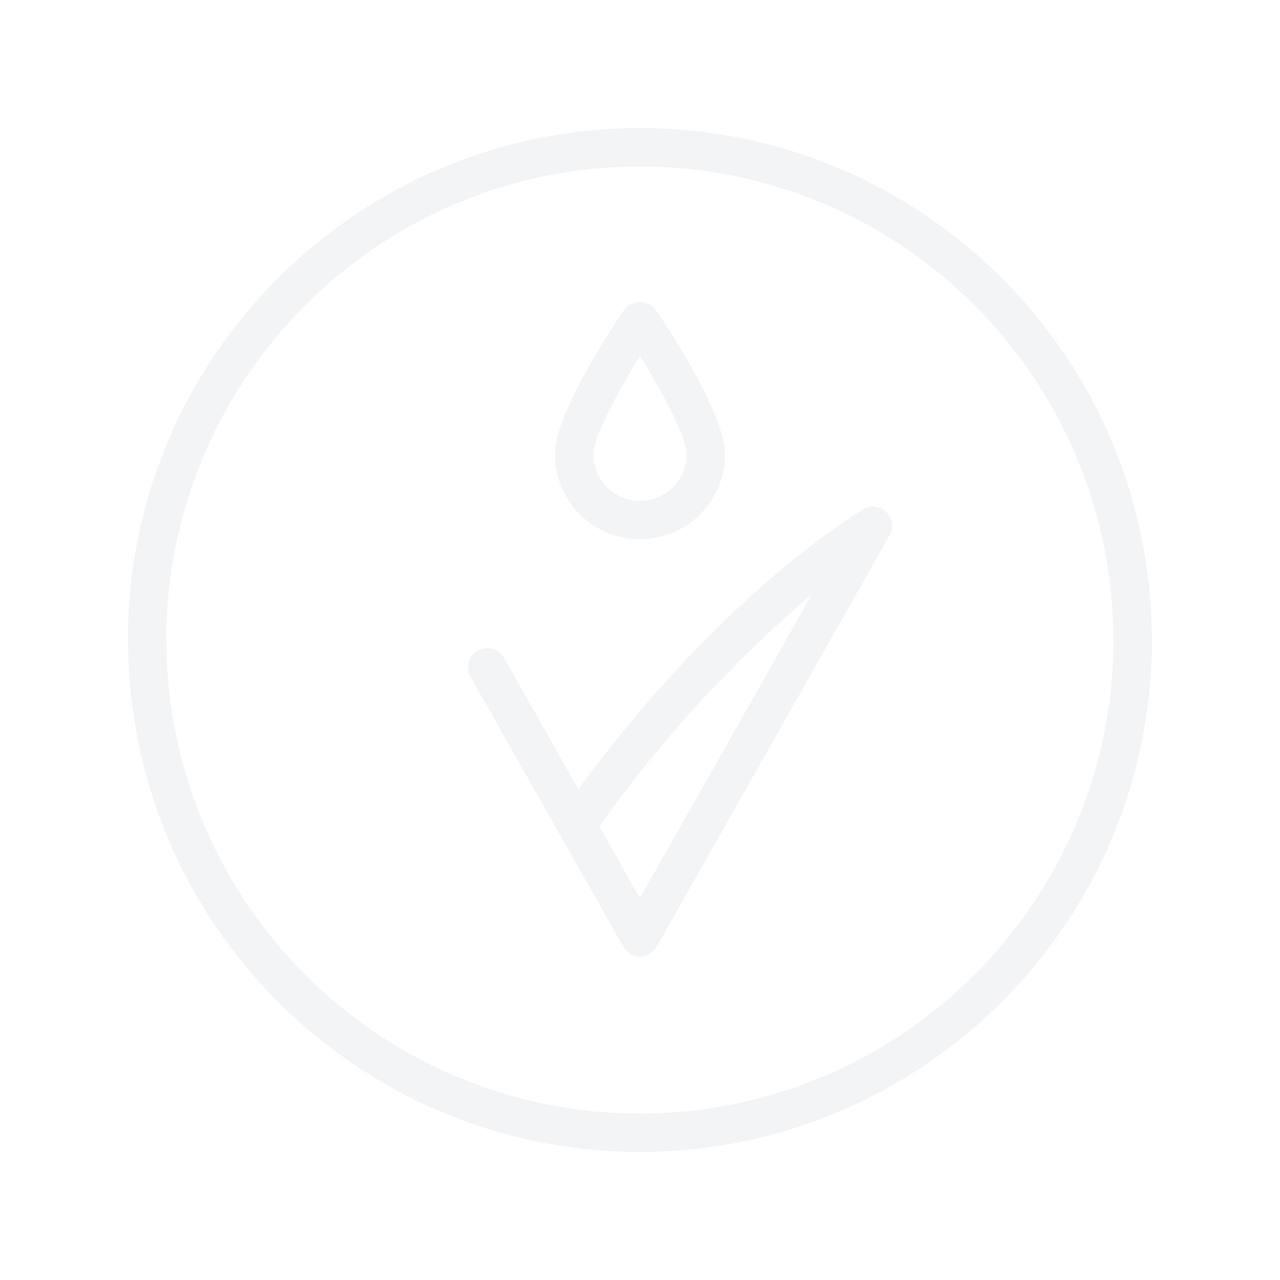 EVERYDAY MINERALS Shimmer Blush сияюший шиммер для лица 4.8g